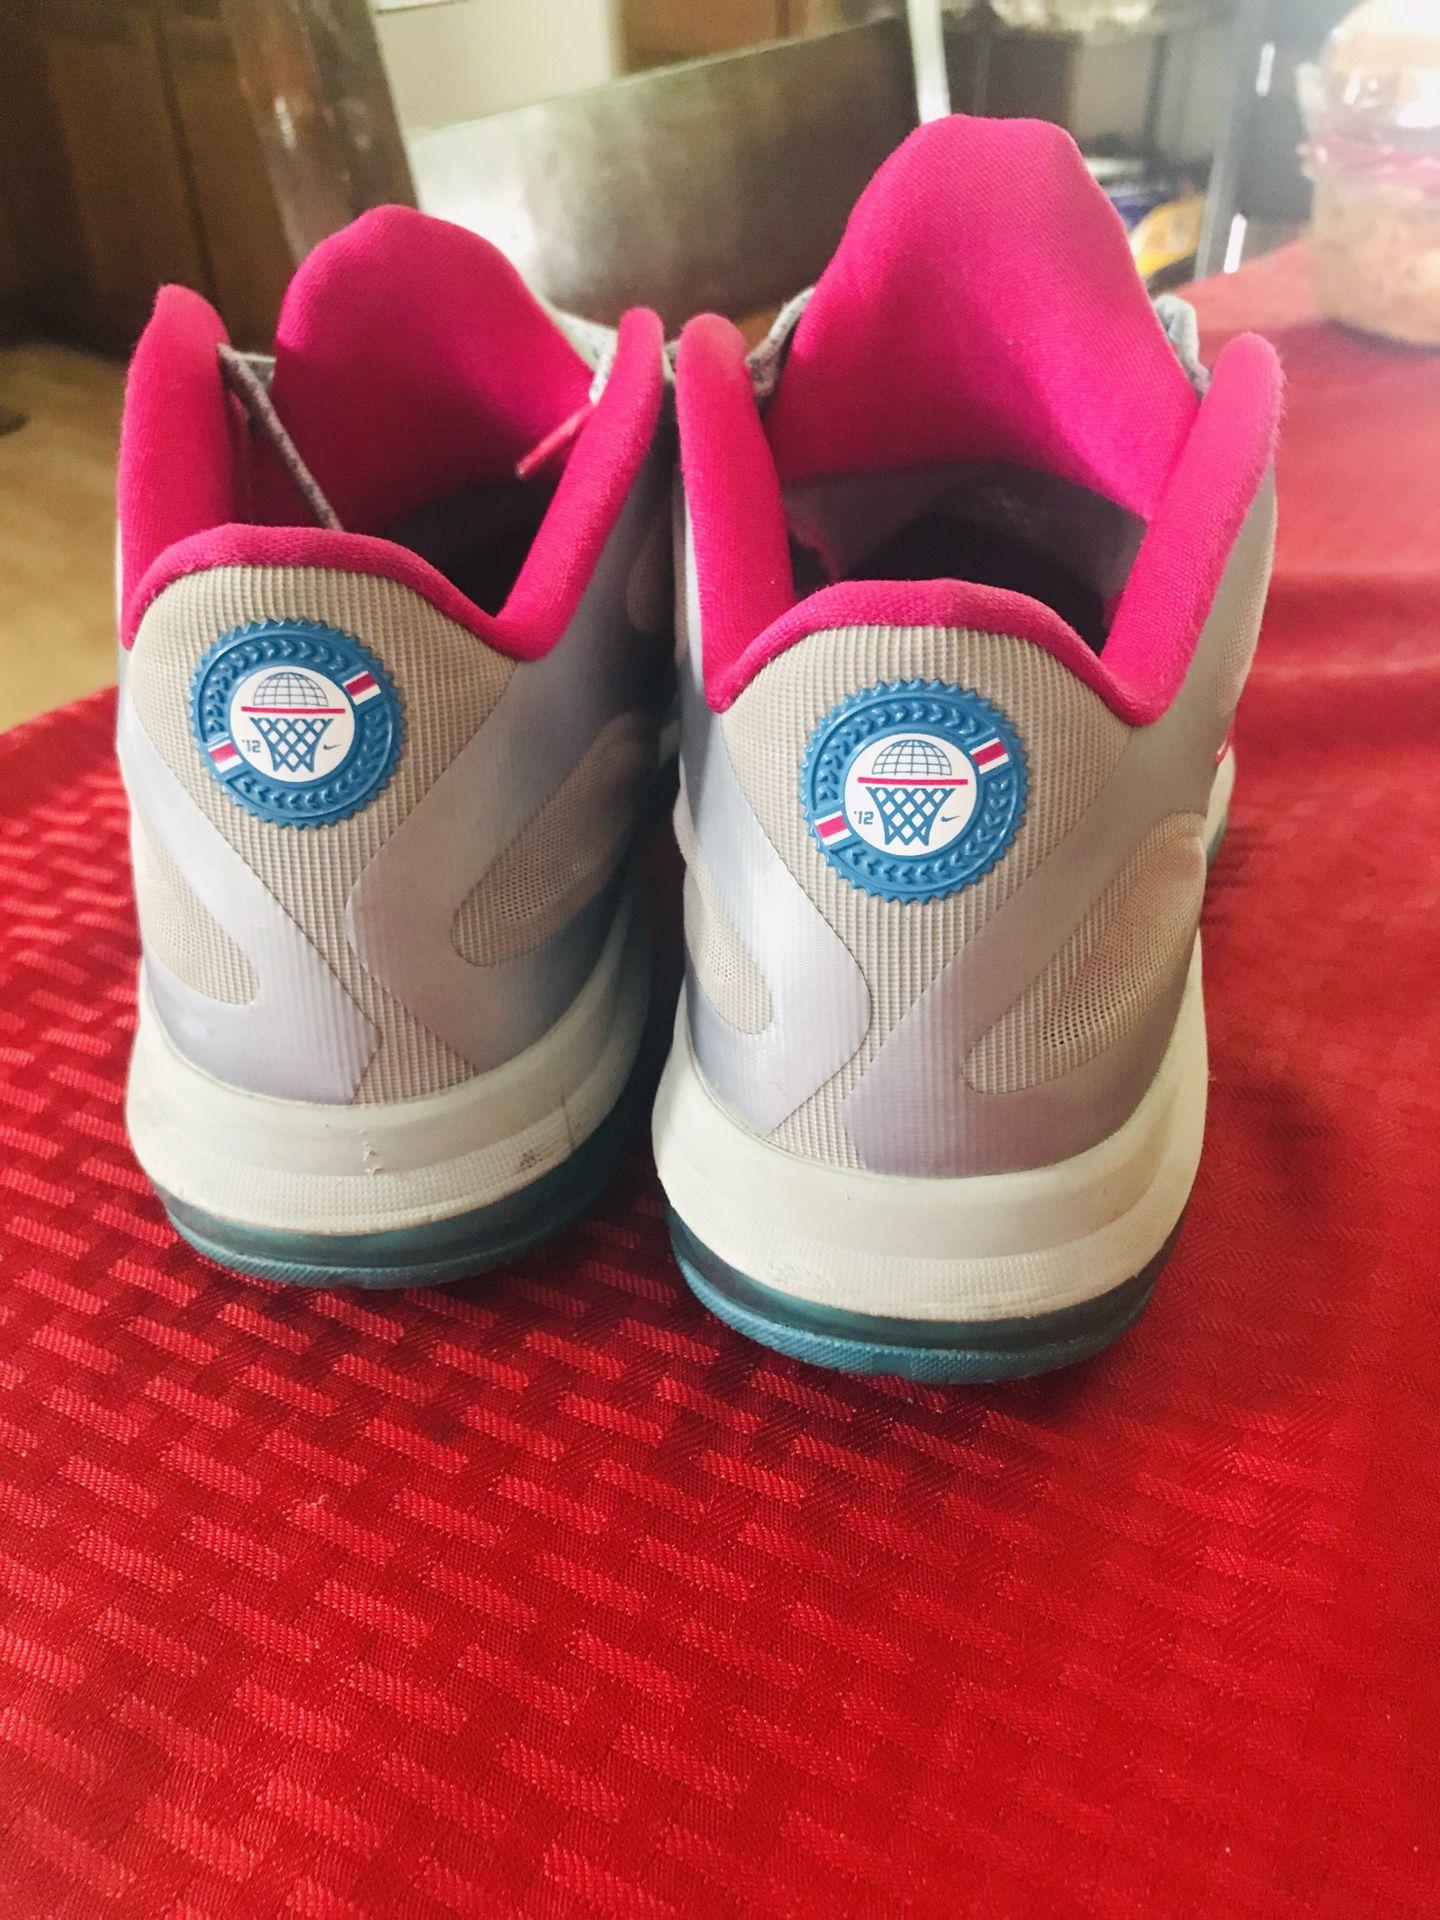 Nike Lebrons size 10 men's